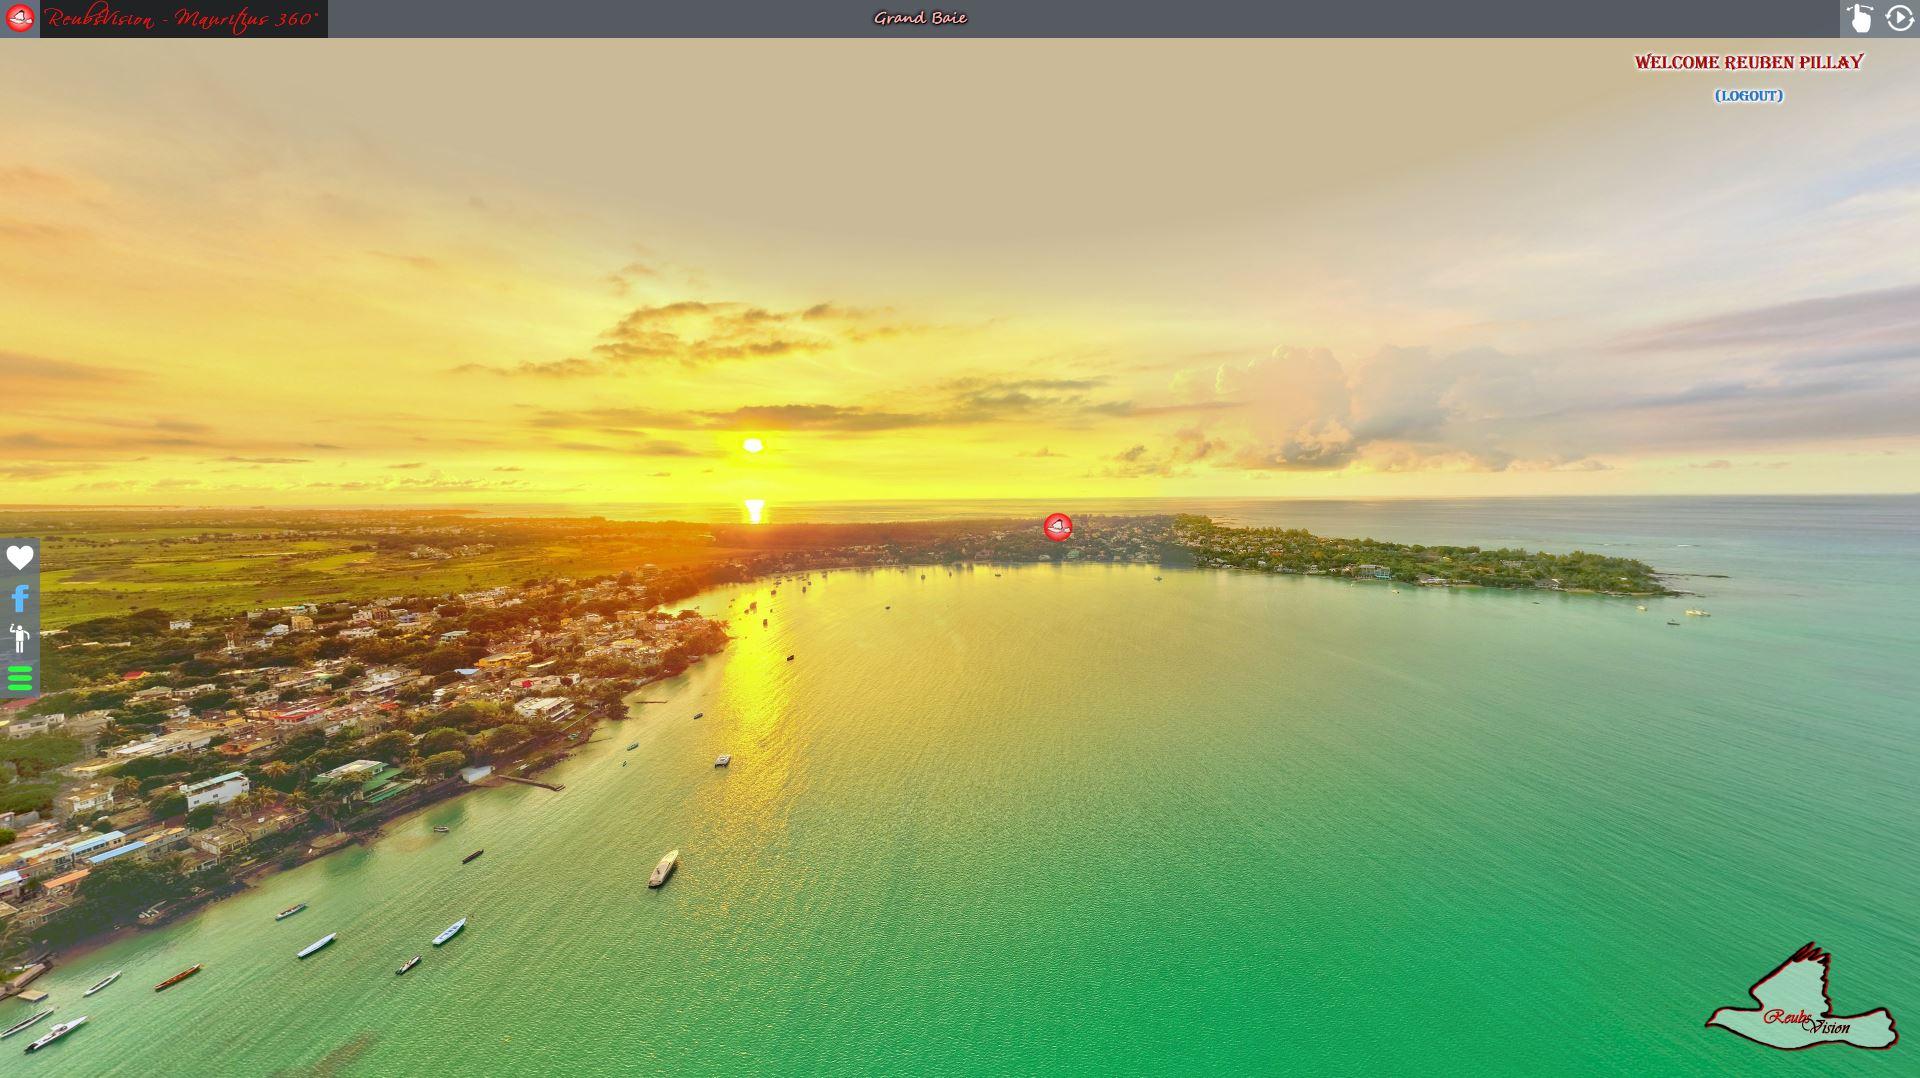 2020-06-26 01_38_52-ReubsVision – Mauritius 360 – Firefox Developer Edition